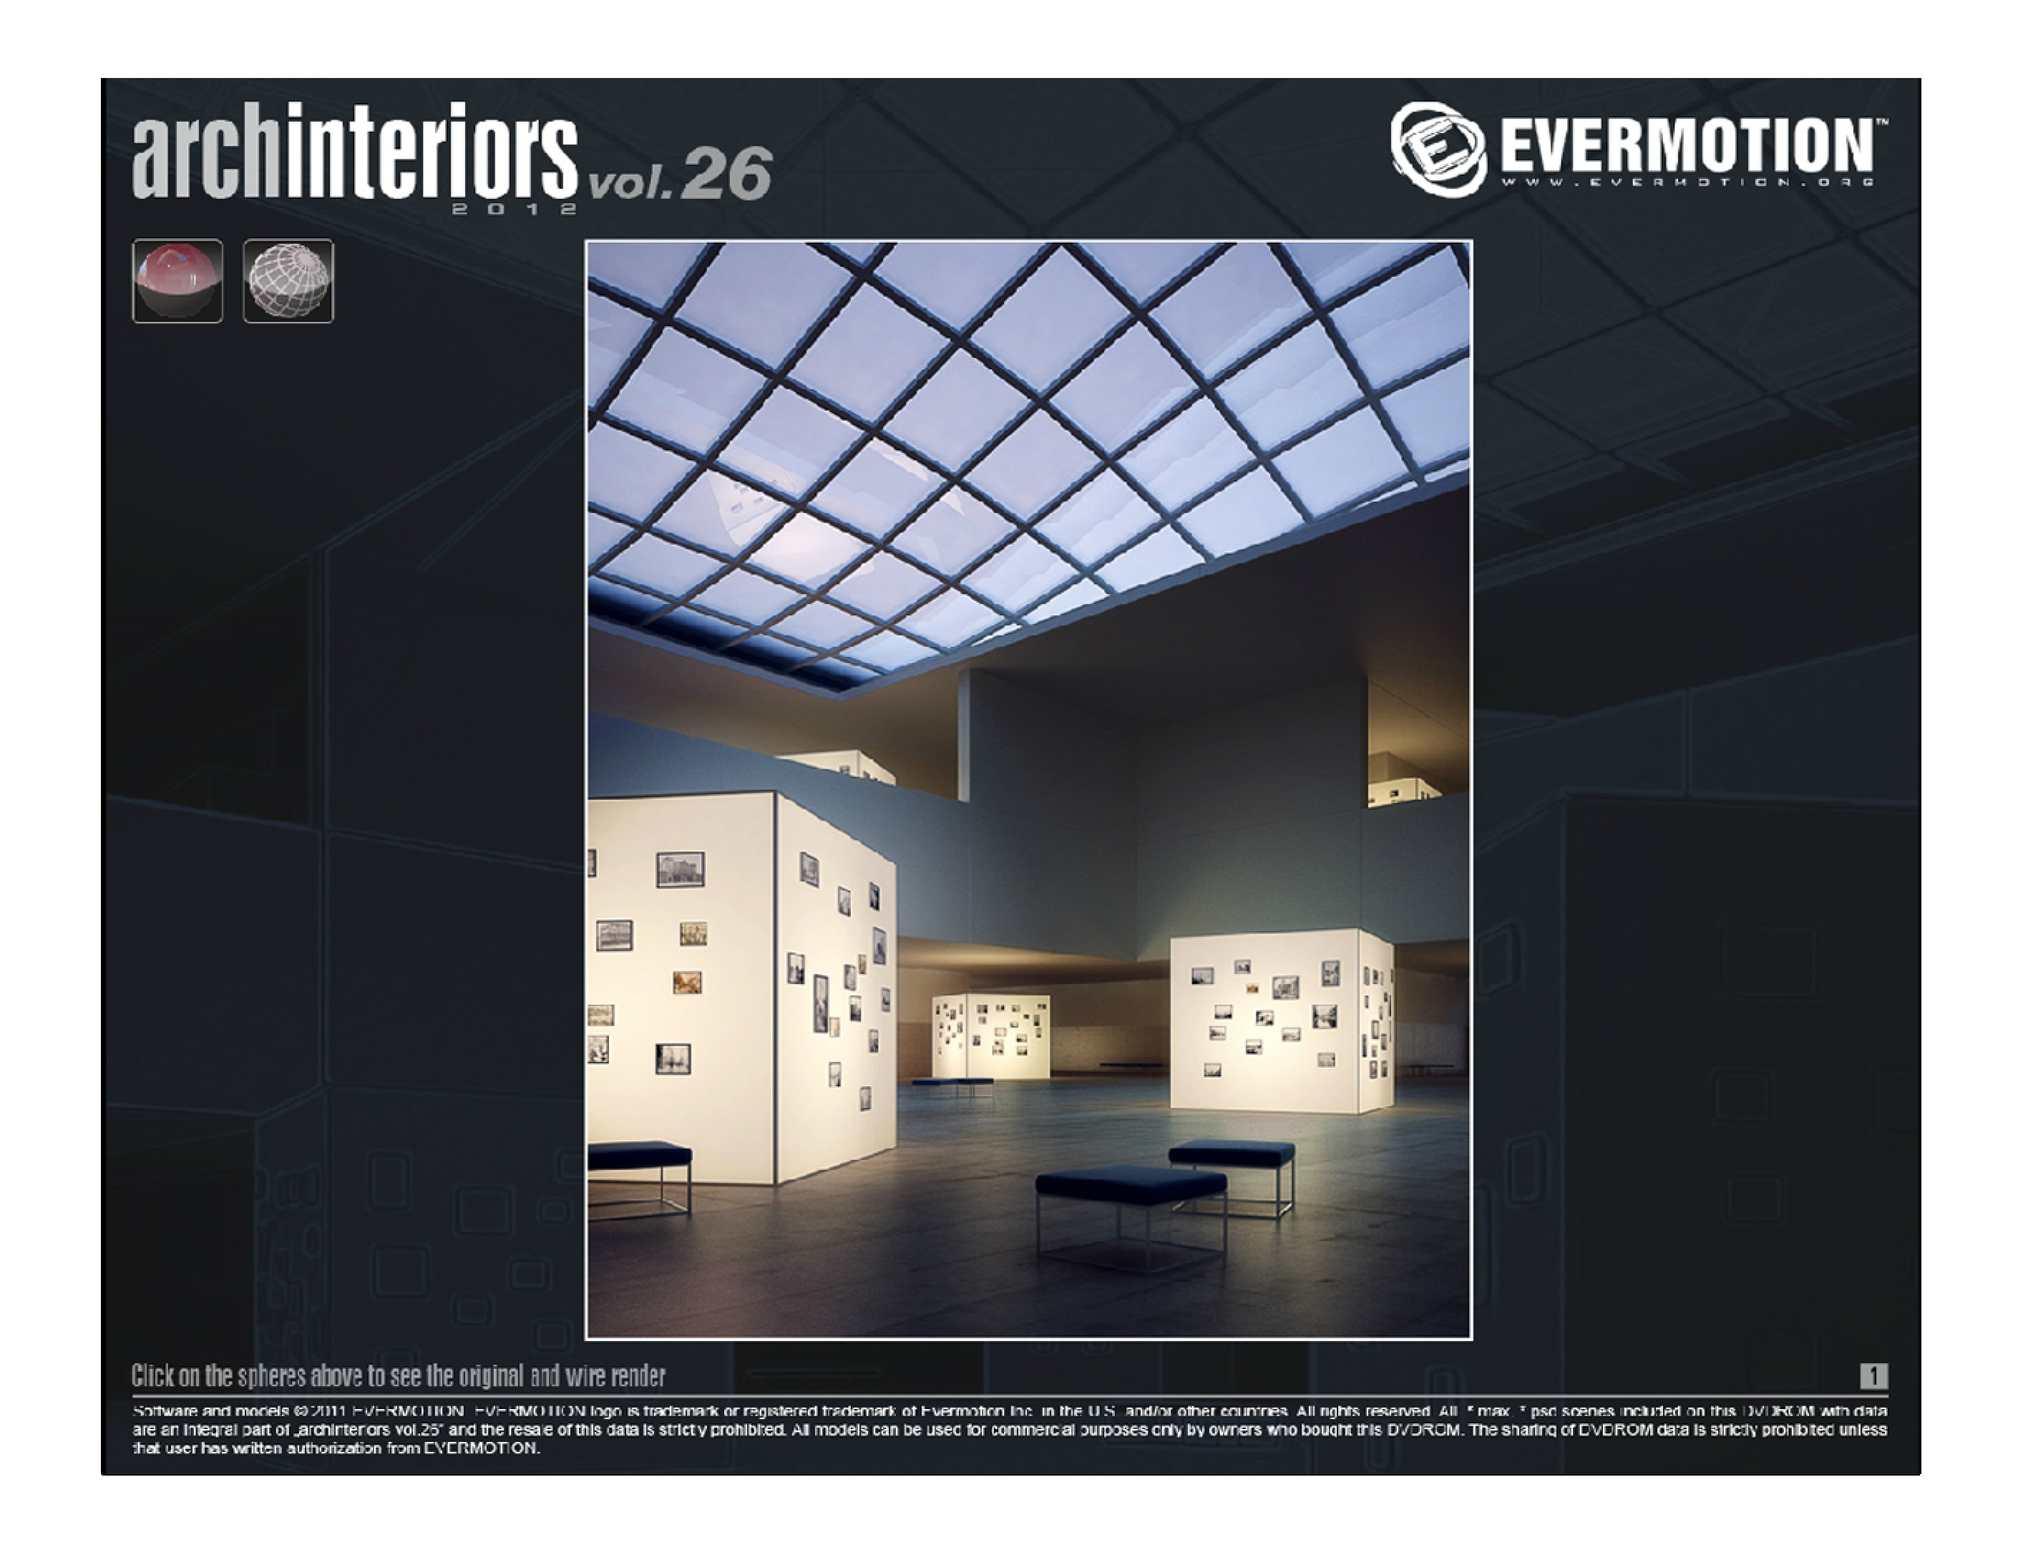 Calaméo   EVERMOTION ARCHINTERIORS VOL.26